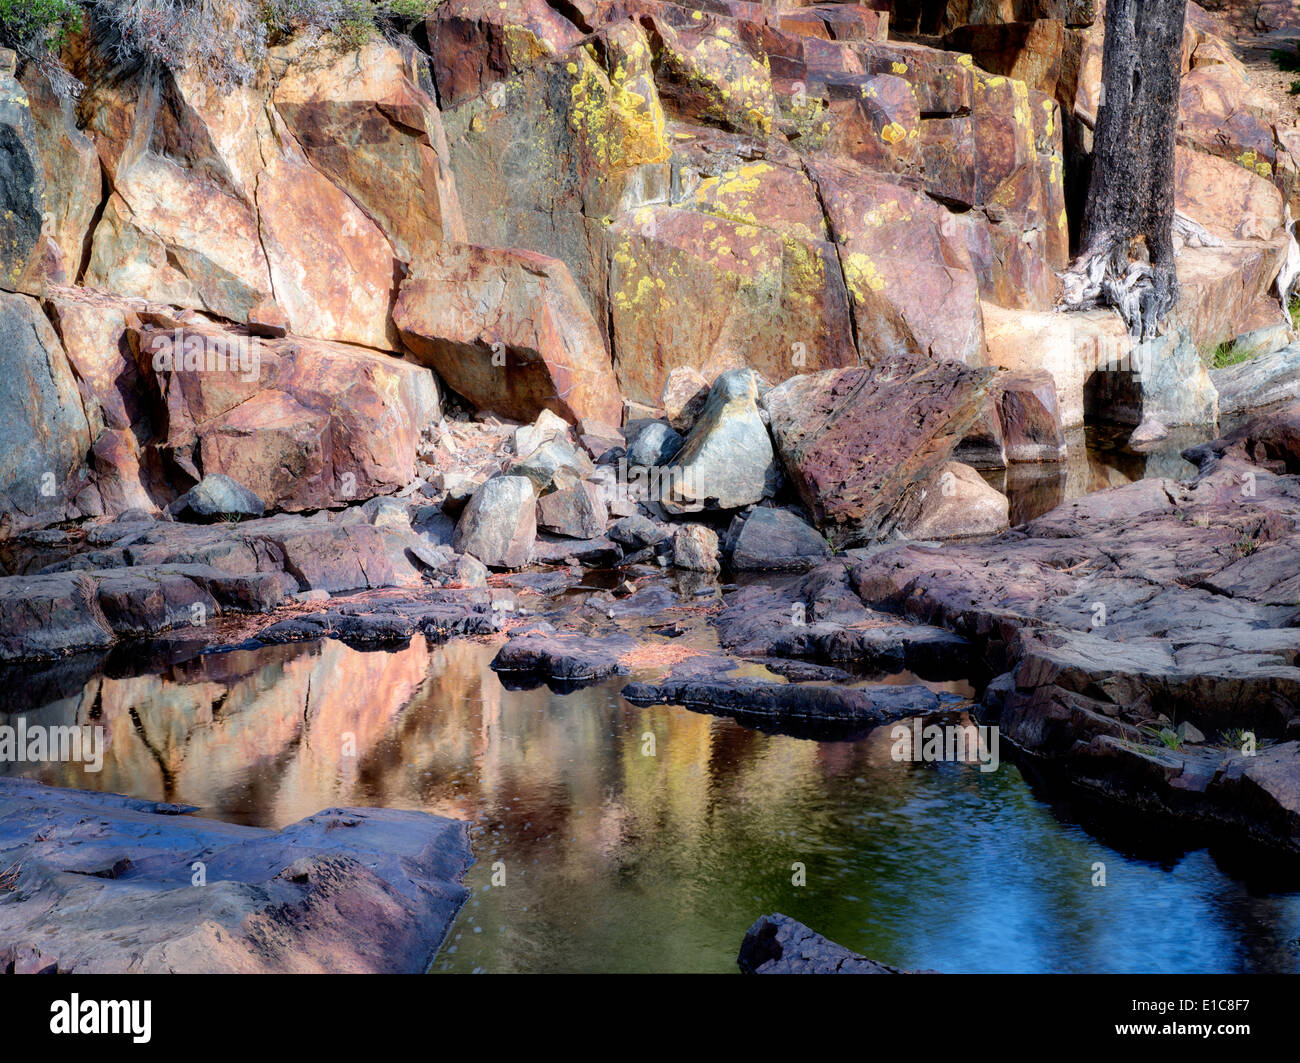 Pool of water with lichen covered rocks on Glen Alpine Creek. Near Fallen Leaf Lake, California - Stock Image